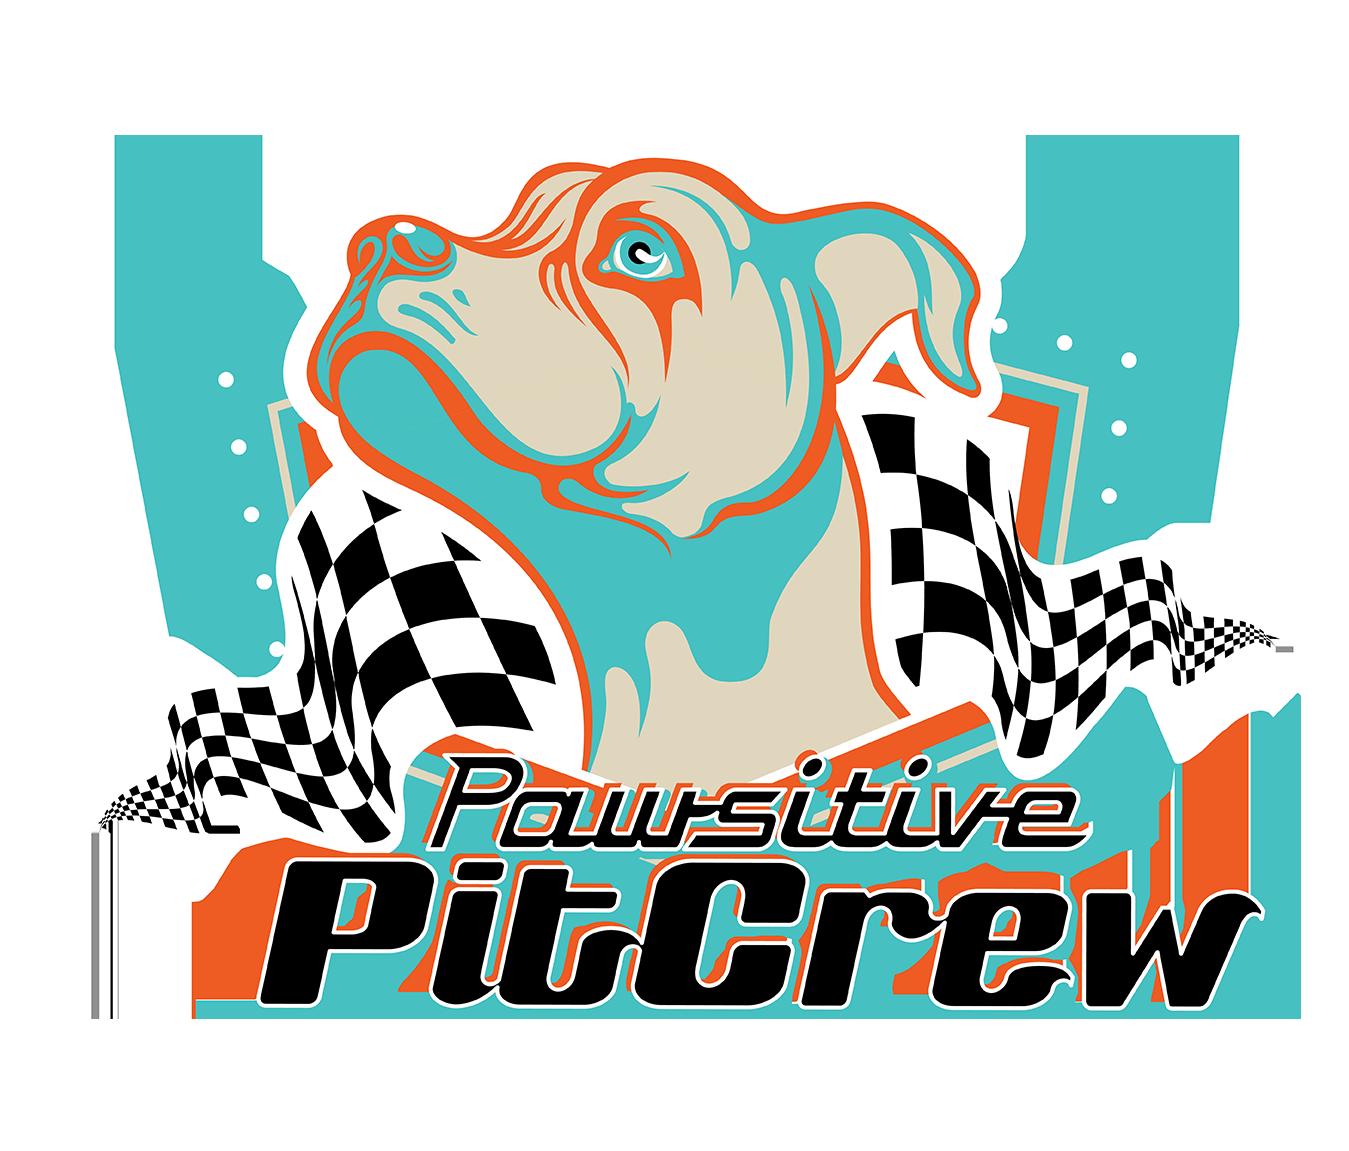 pawsitivepitcrew-01